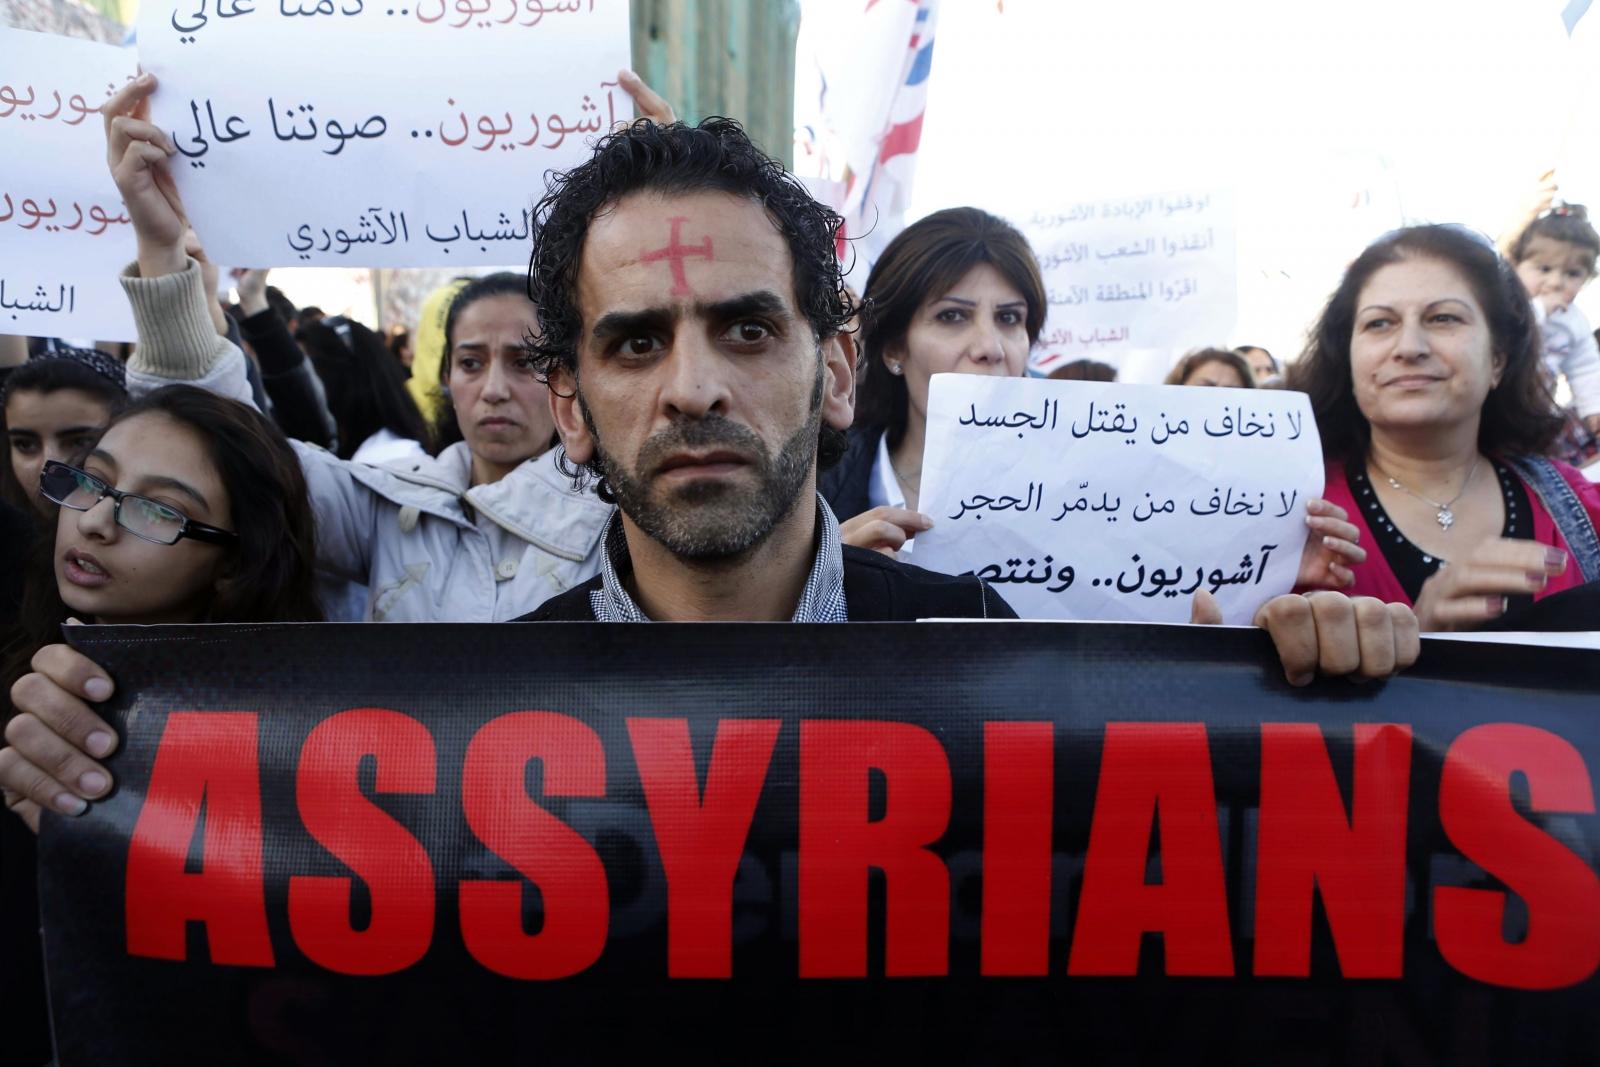 isis-assyrian.jpg